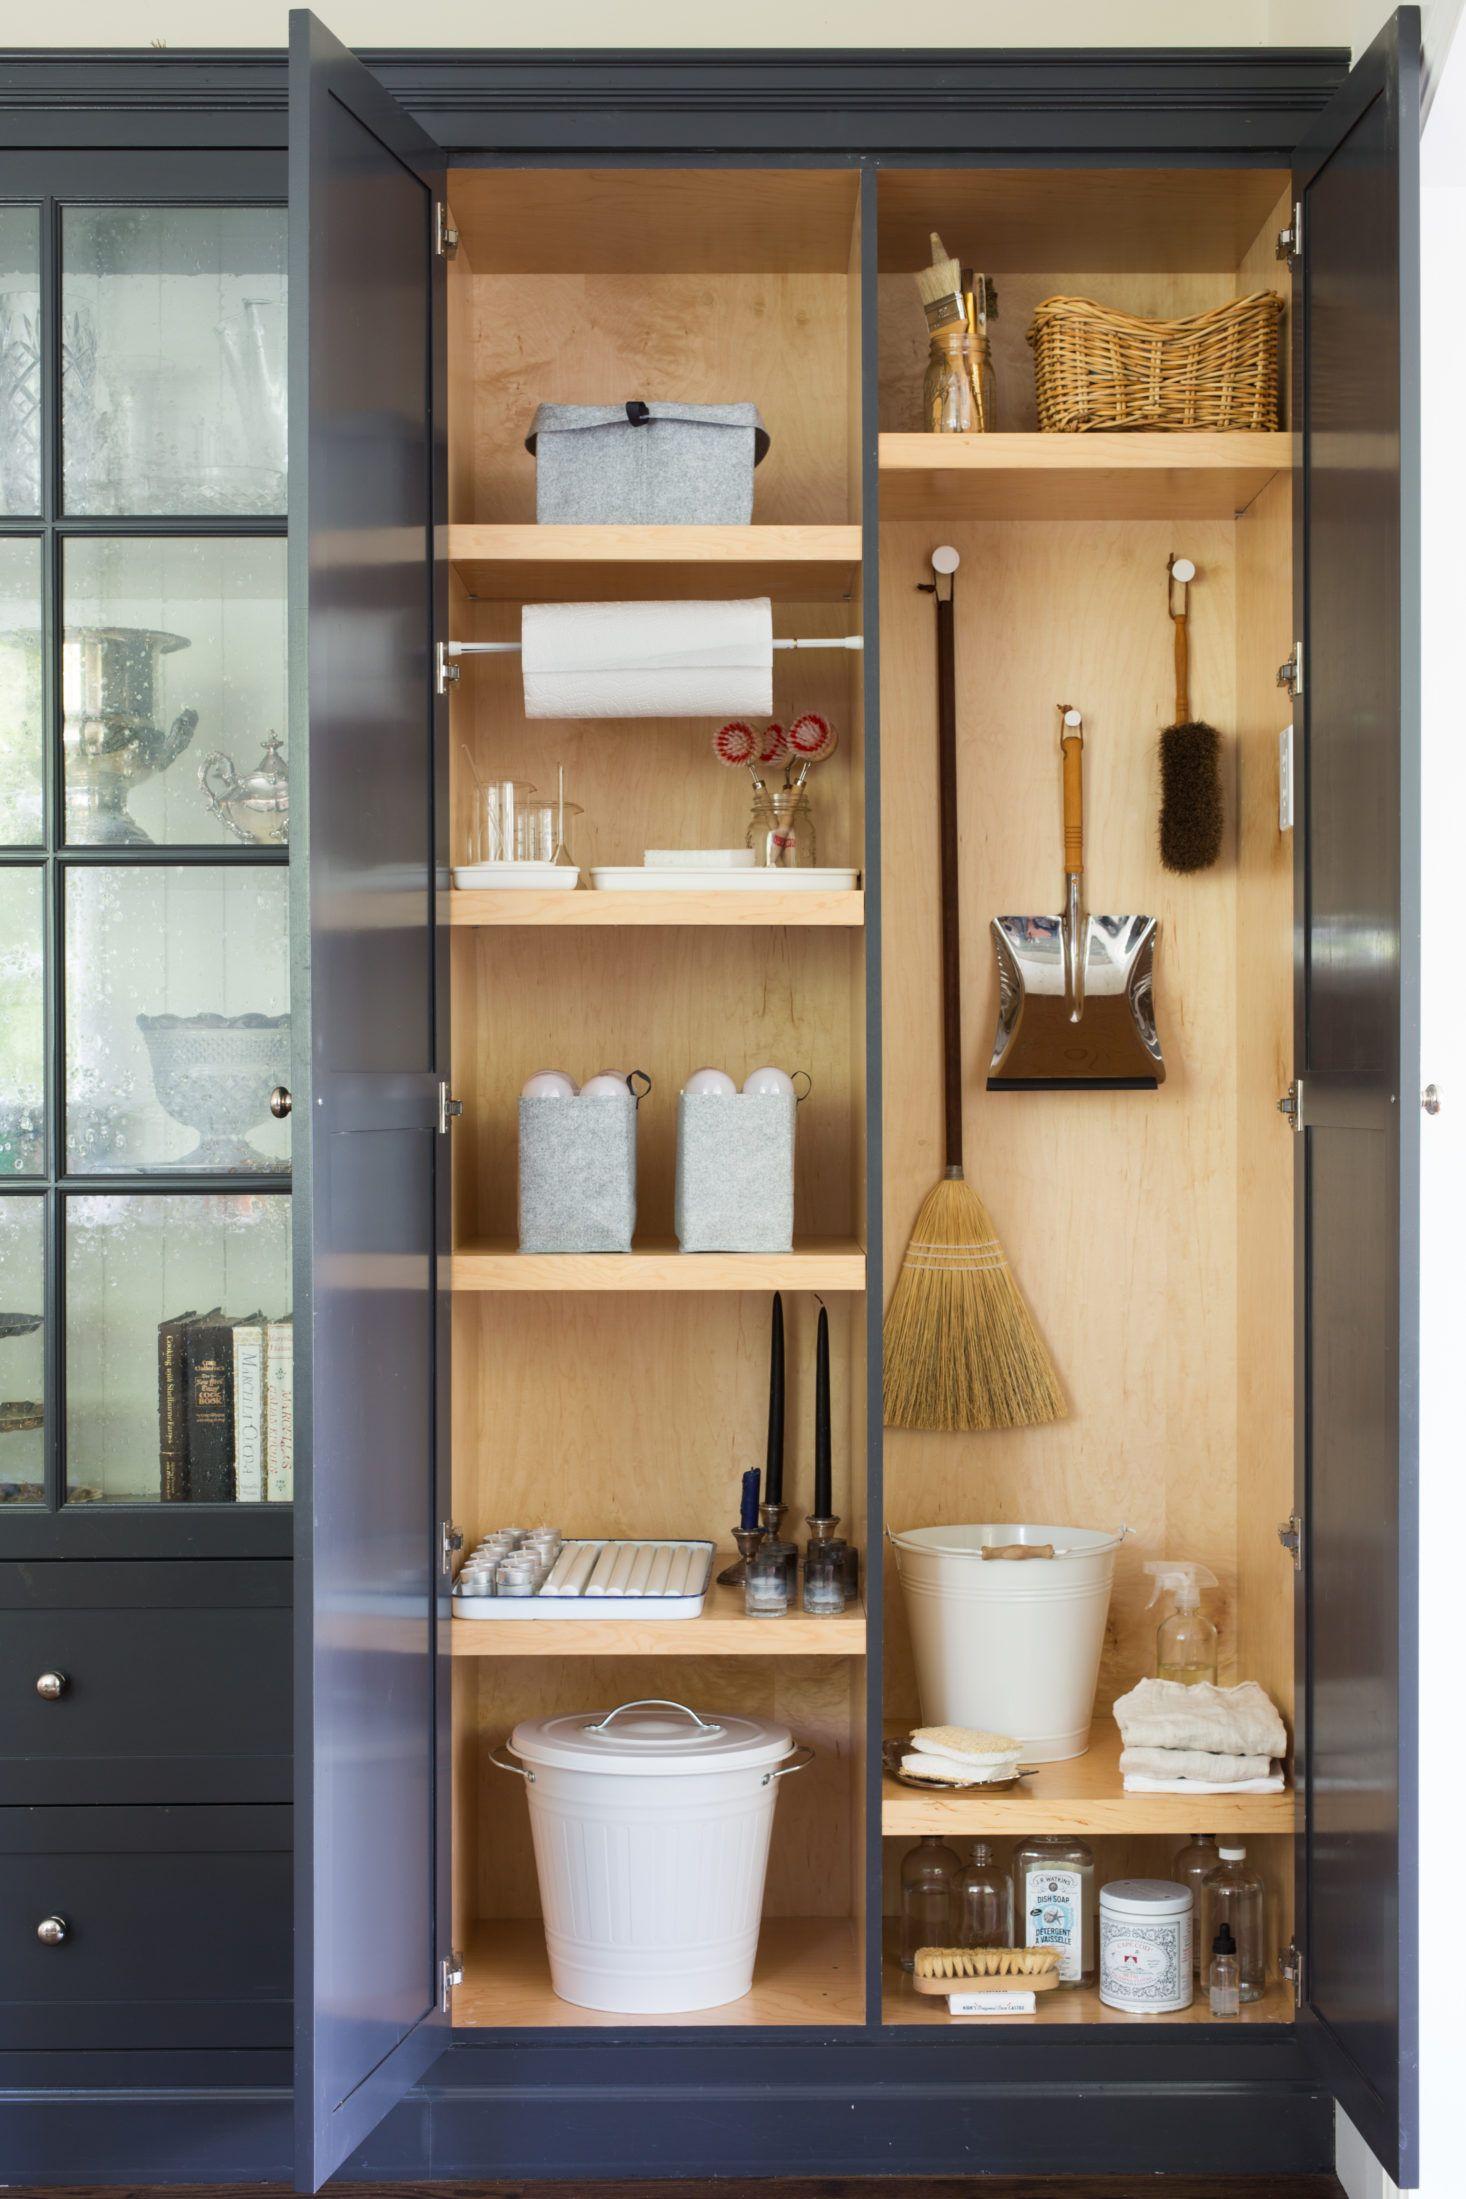 What S Inside The Stealth Utility Closet The Organized Home Utility Closet Cleaning Closet Broom Closet Organizer